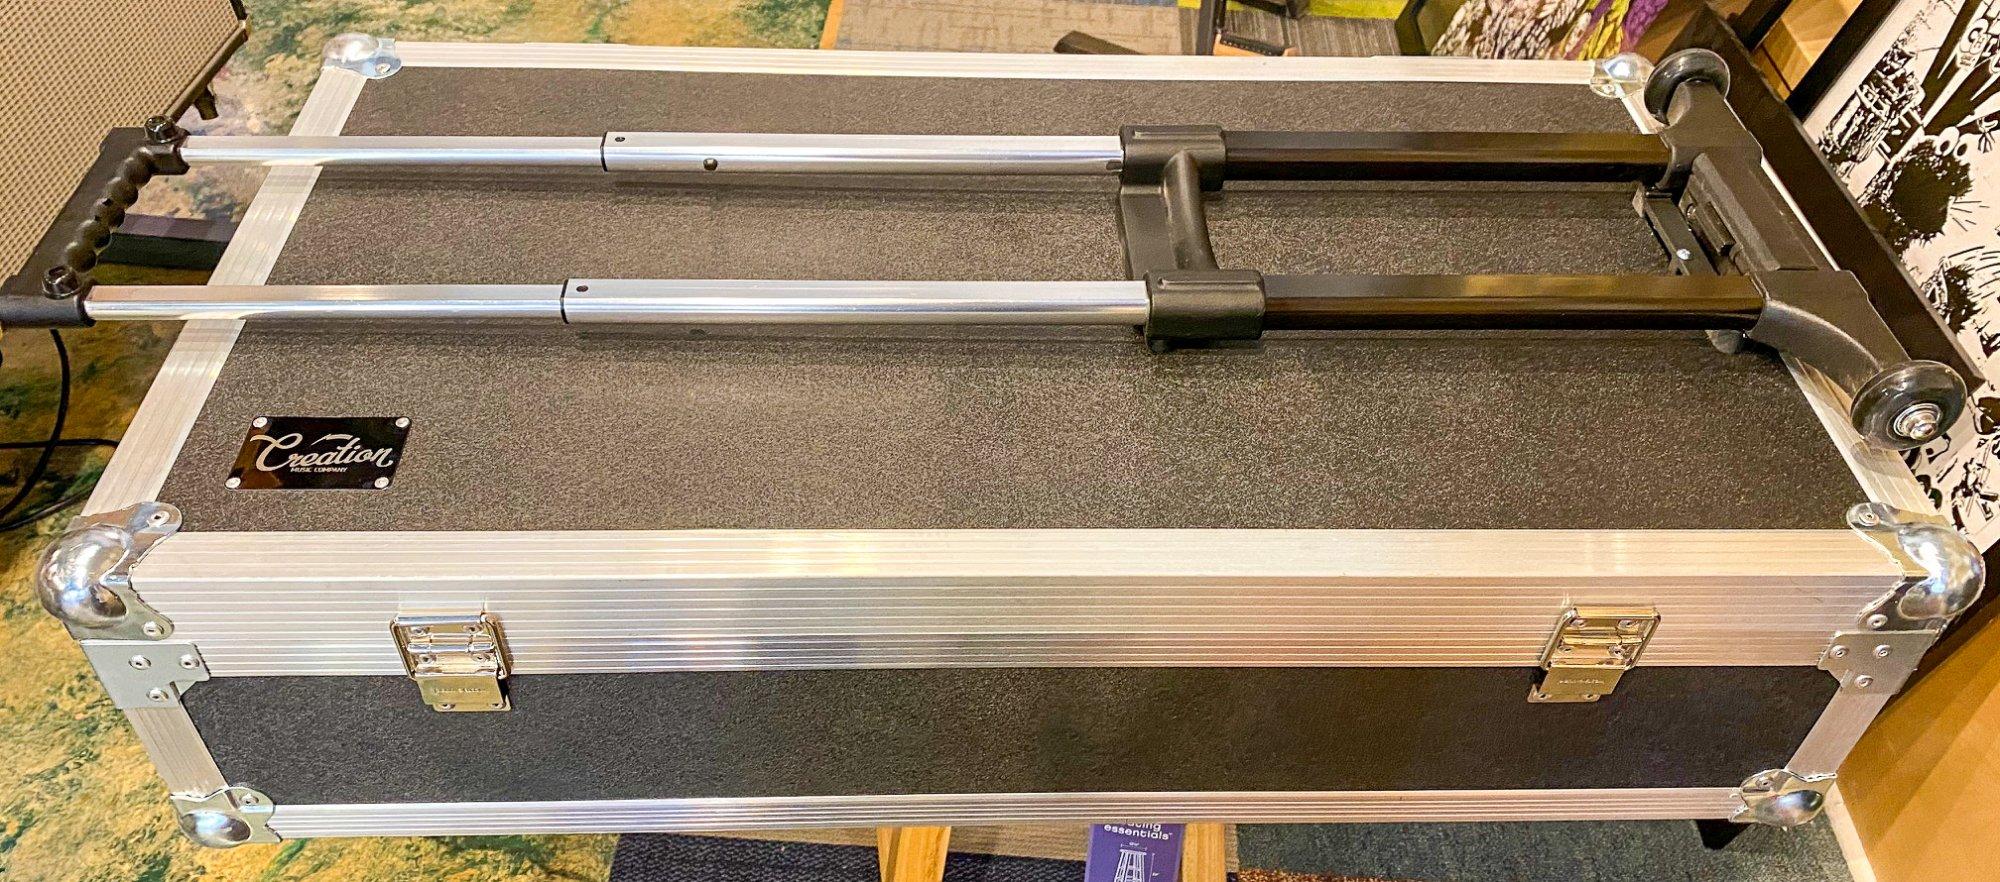 Creation Music Company Aero Series 32x16 flight case w/Drop in pedal board